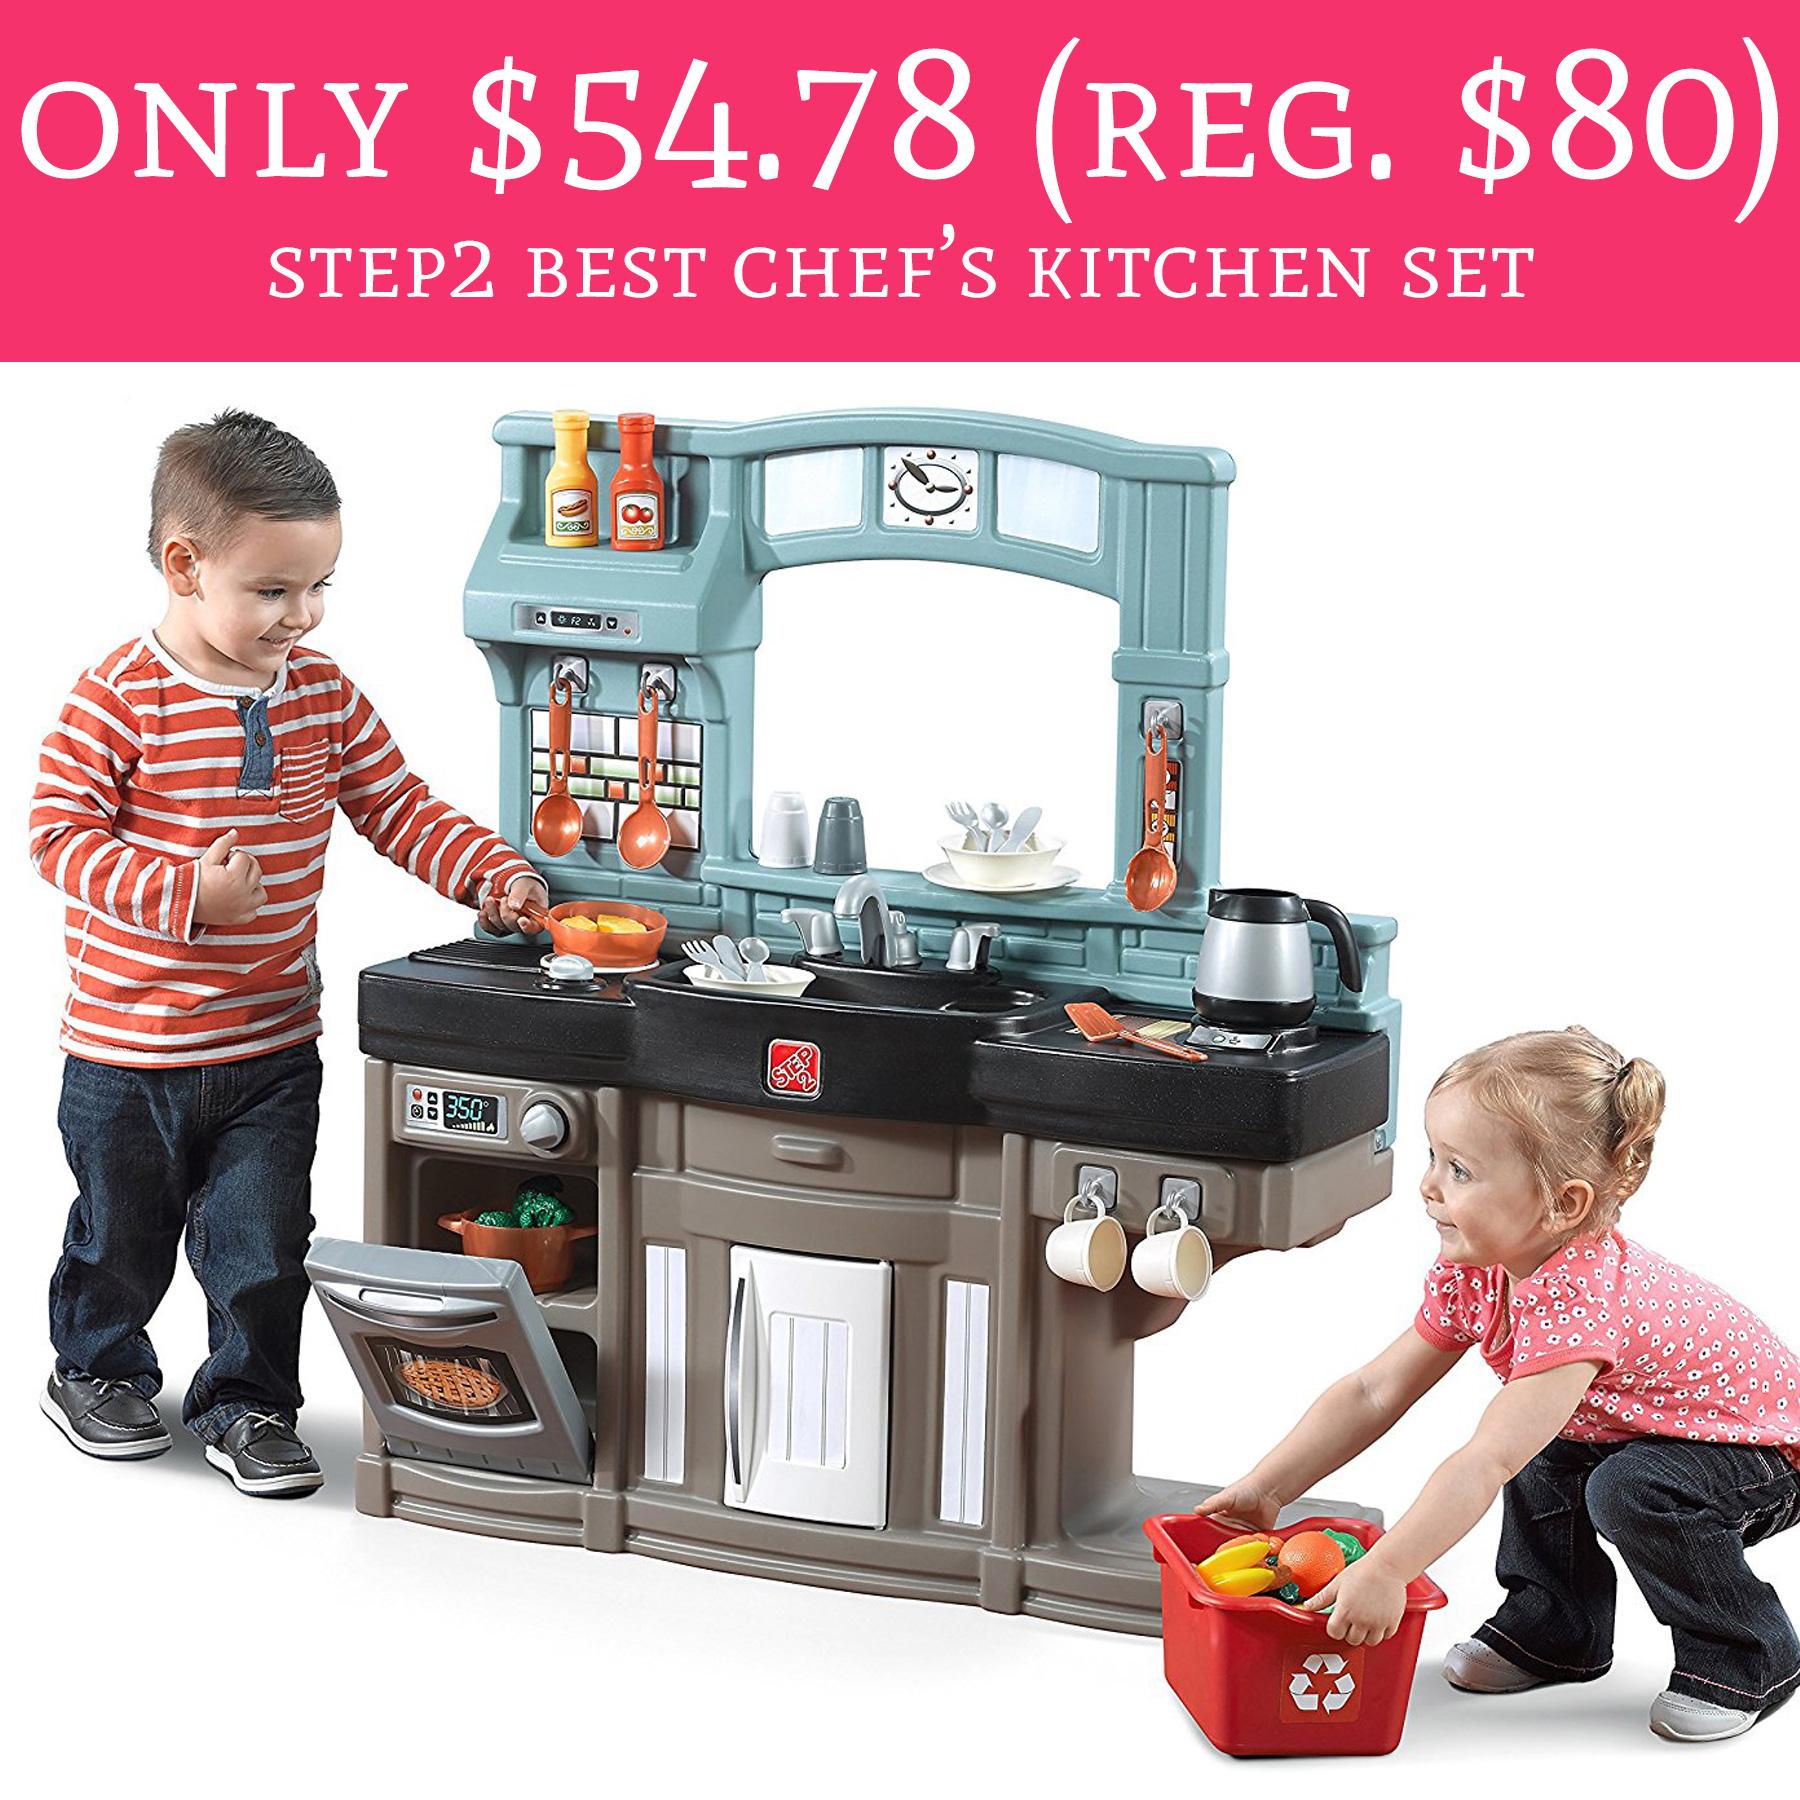 Only regular 80 step2 best chef 39 s kitchen set for Kitchen set deals